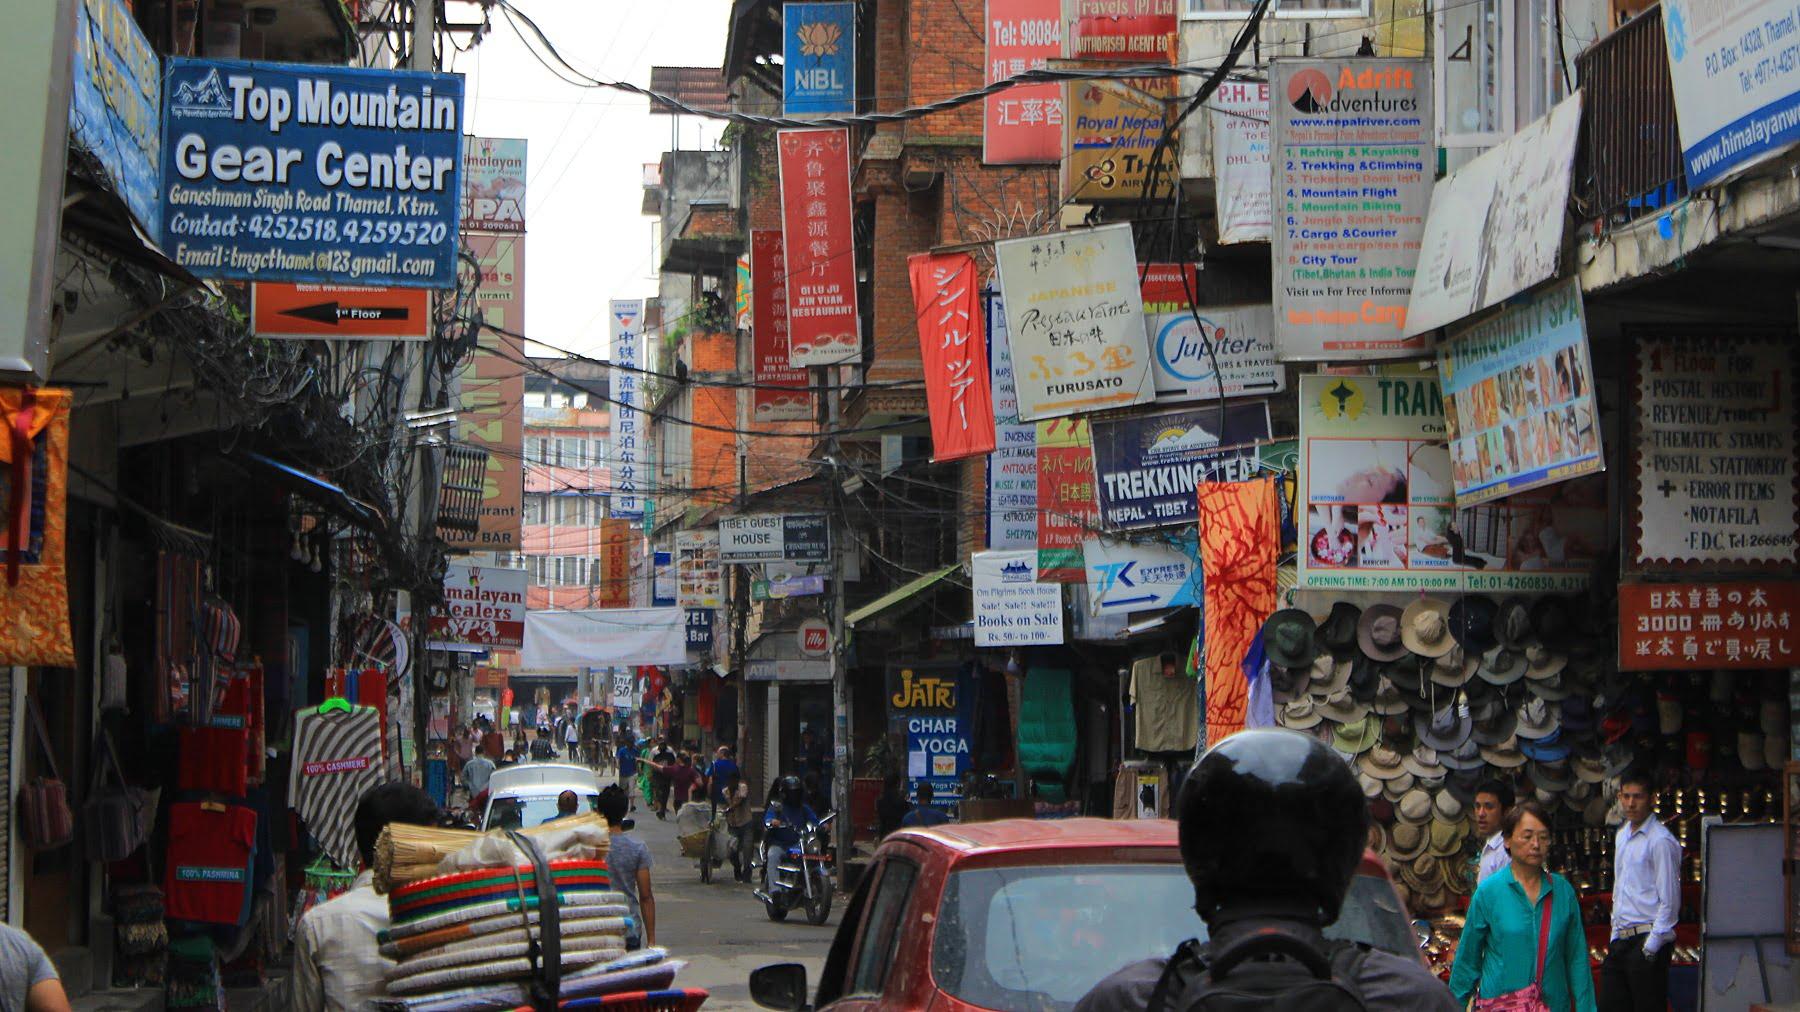 A street with plenty of business signs in Thamel, Kathmandu. I hate Thamel.